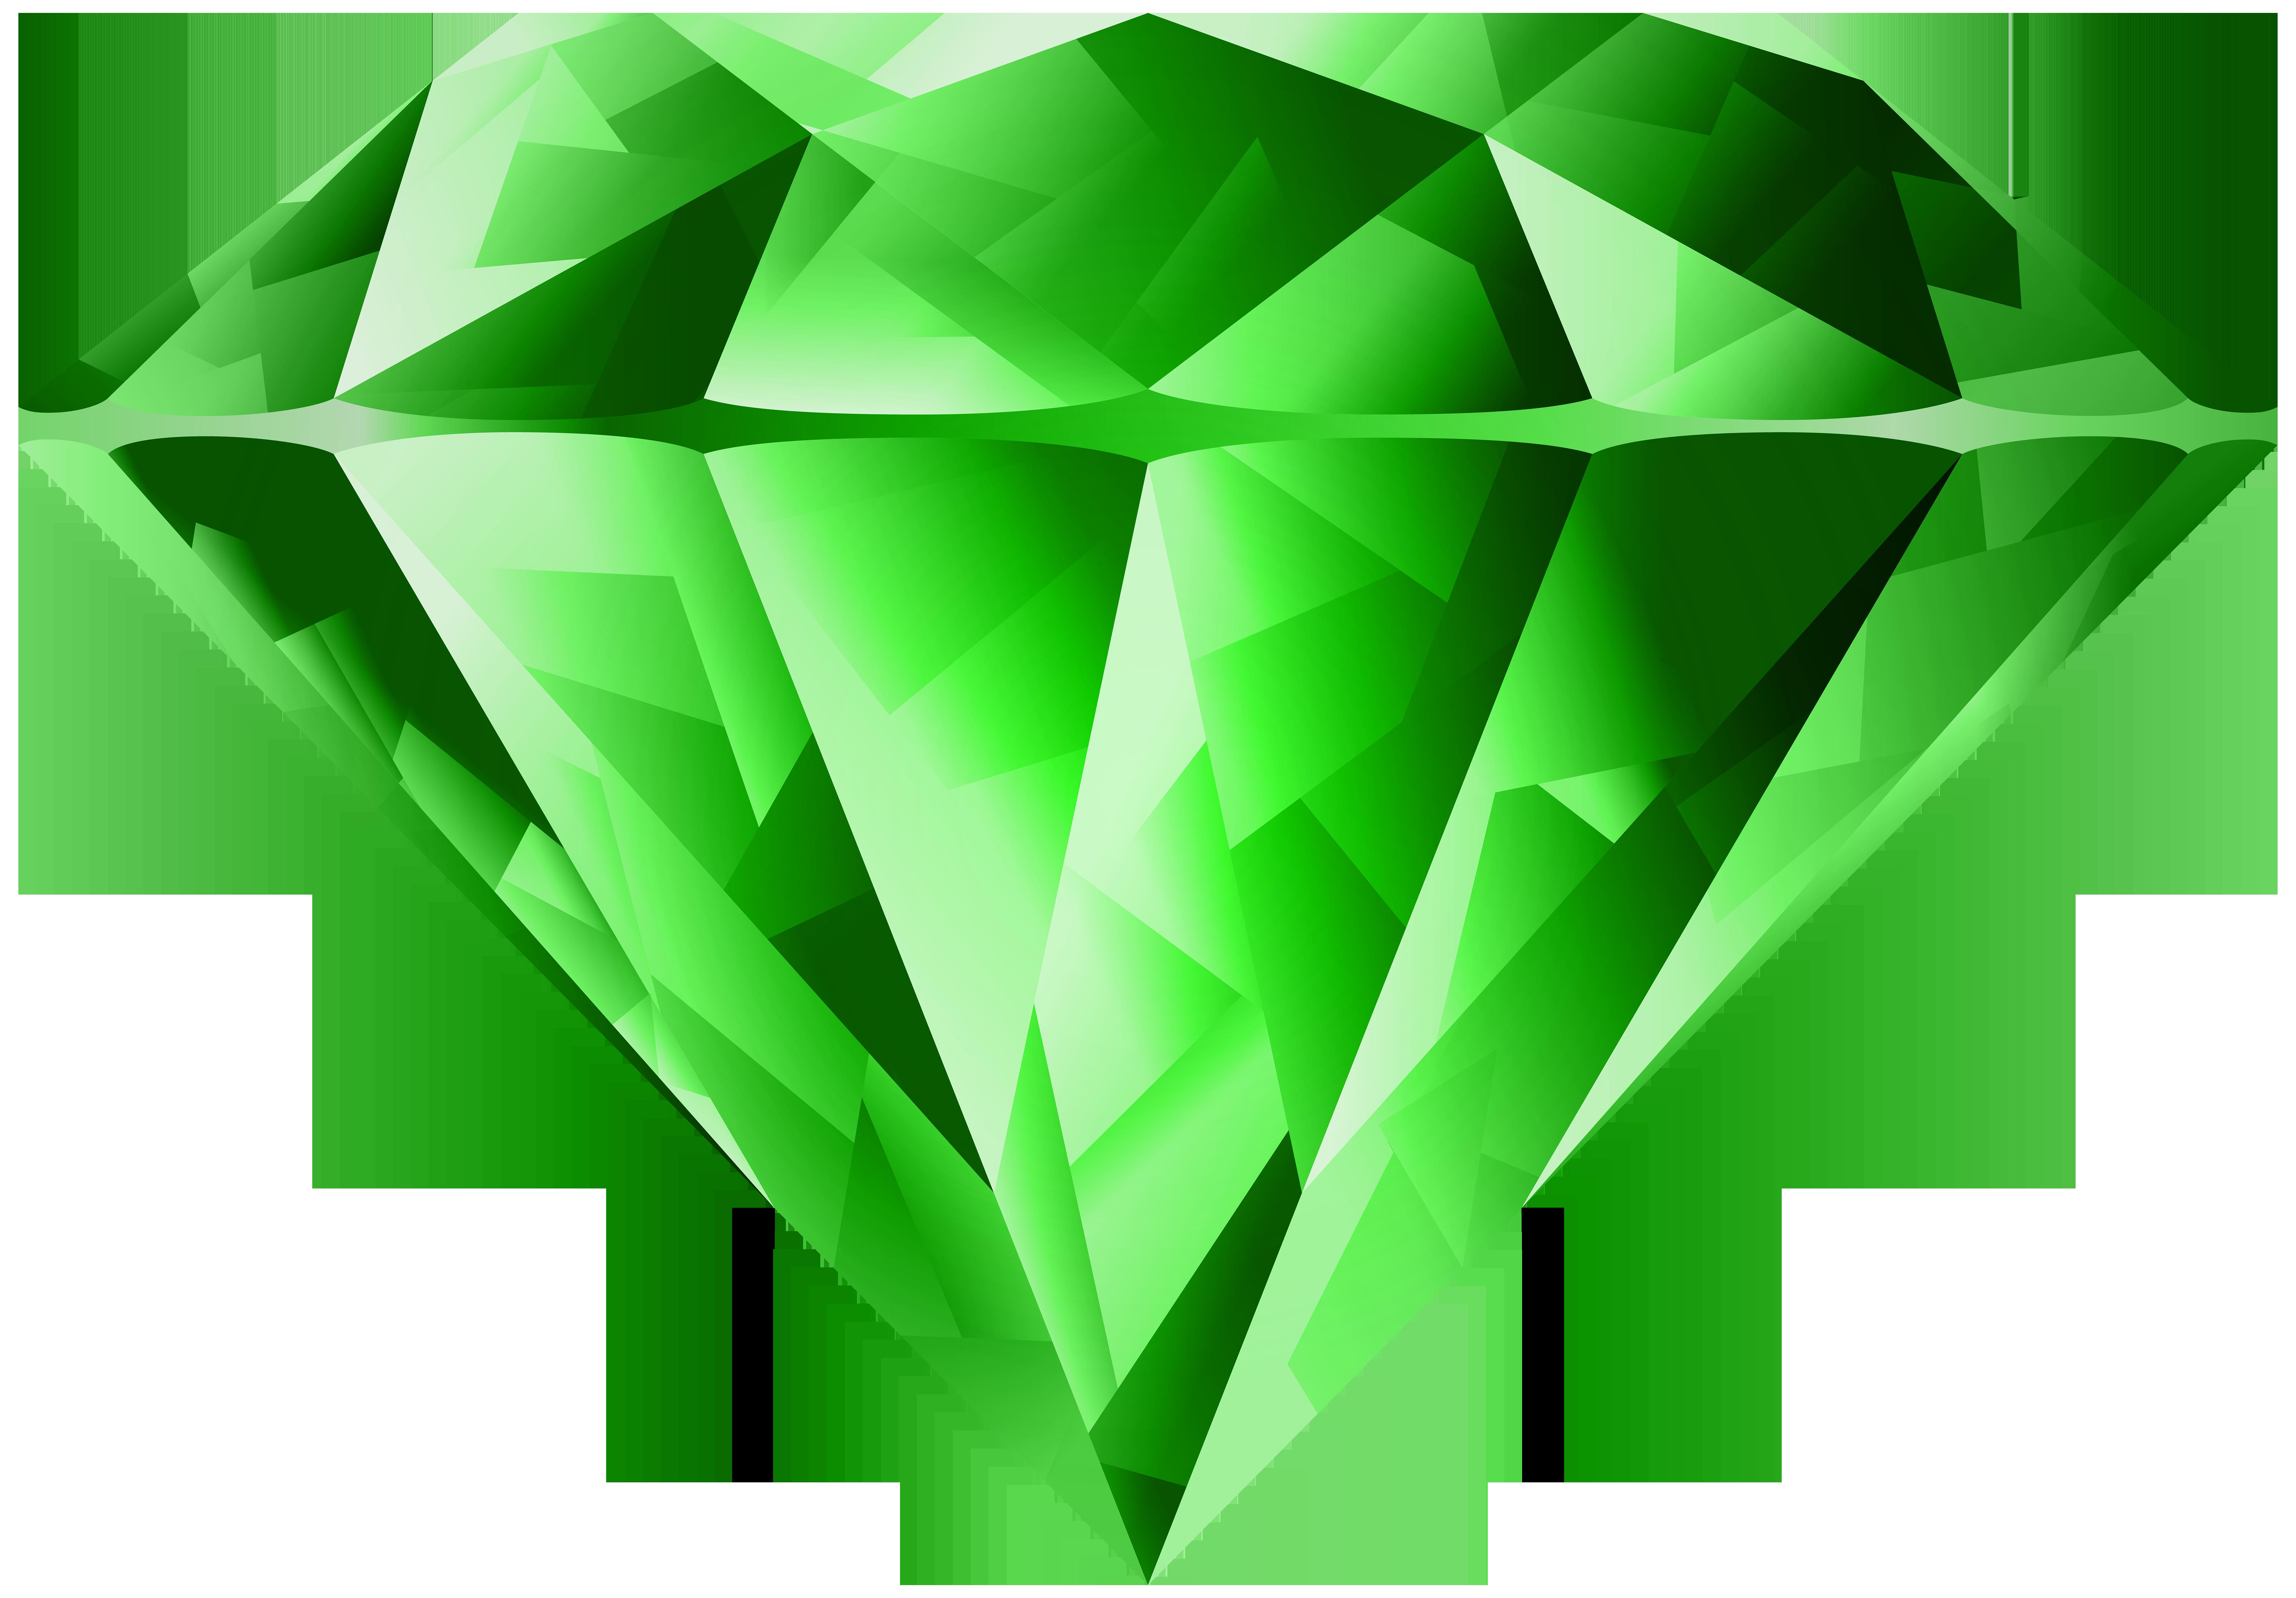 Transparent png clip art. Diamond clipart green diamond